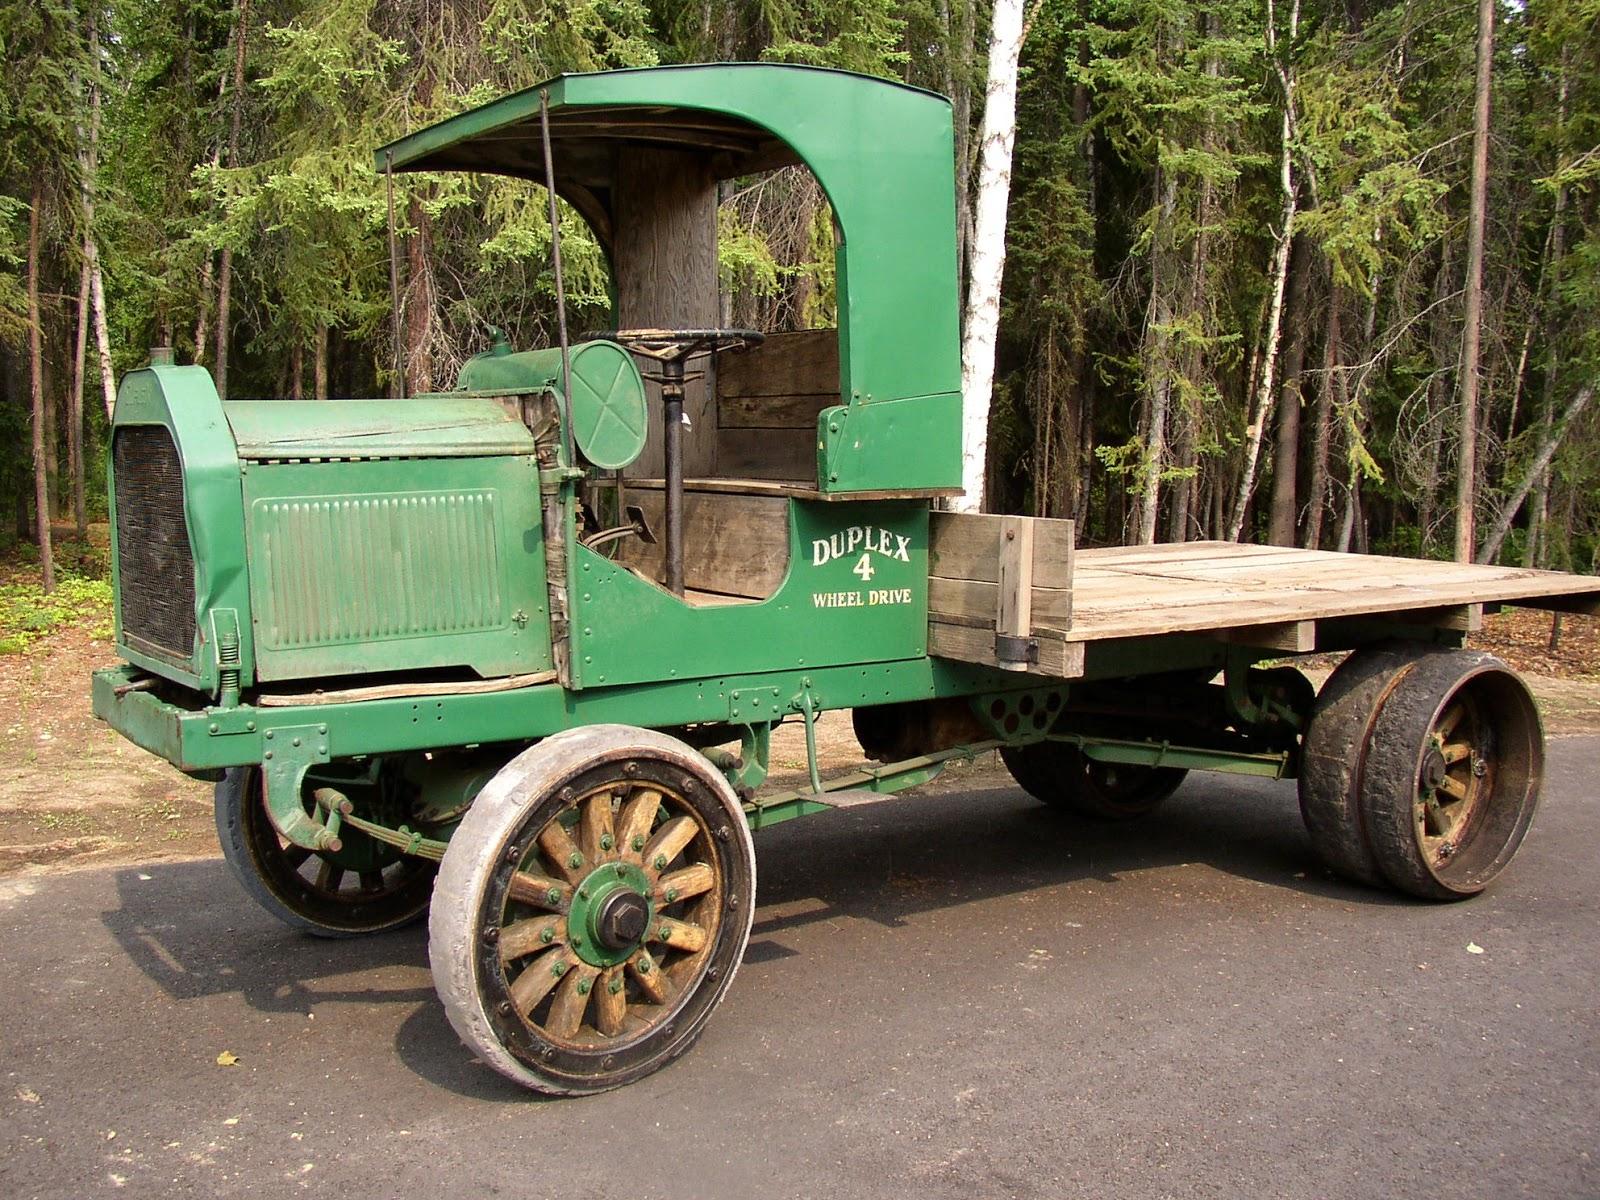 Fountainhead Antique Auto Museum: Built Like a Mack AB Flatbed Truck